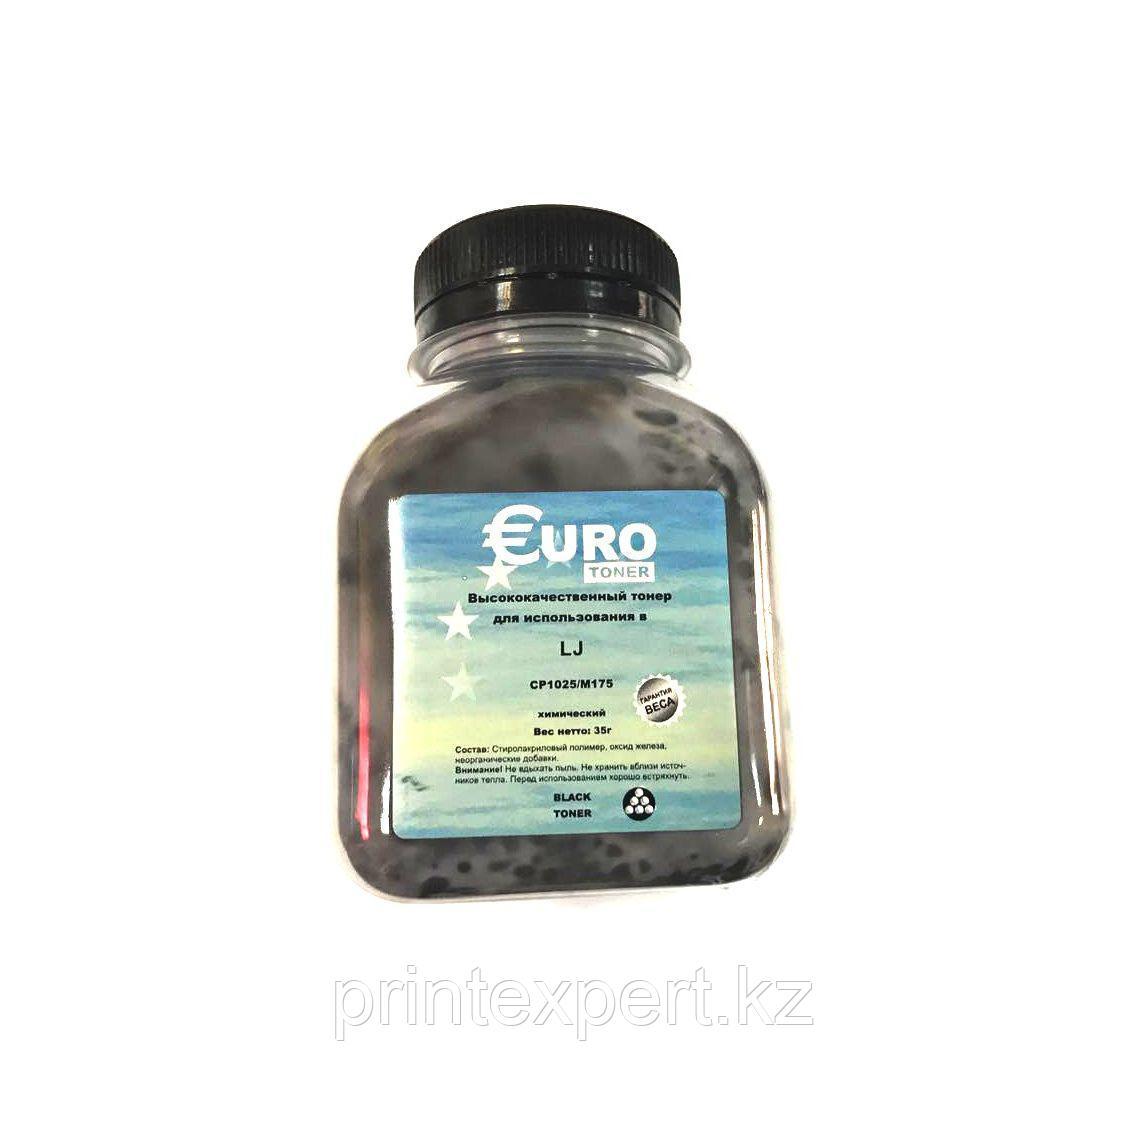 Тонер EURO TONER для HP CLJ CP1215/1515/1518/1312 Universal Black химический (55 гр)